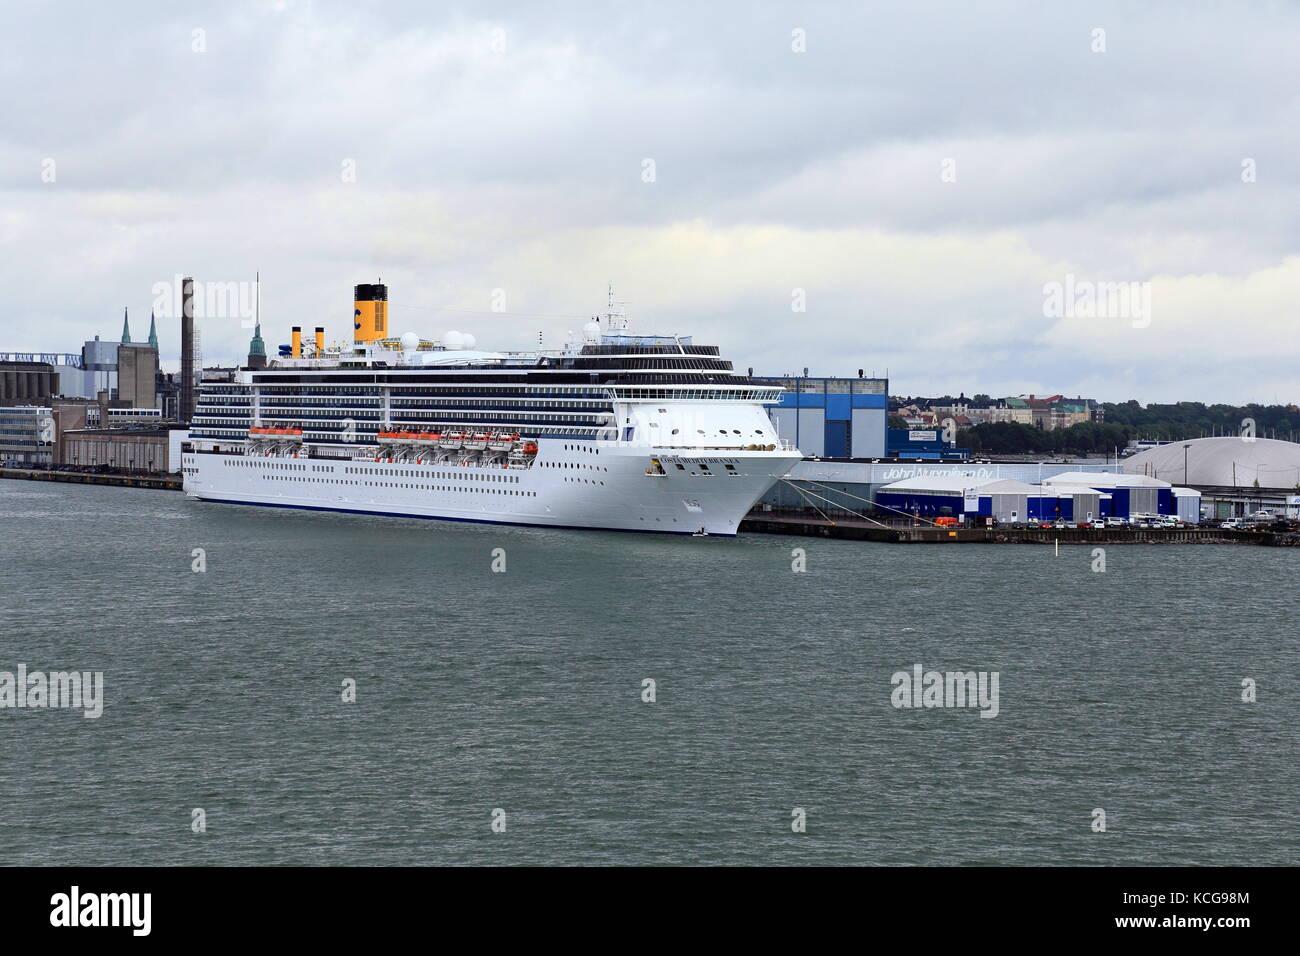 Costa Mediterranea cruise ship in the harbour of Helsinki, Finland - Stock Image